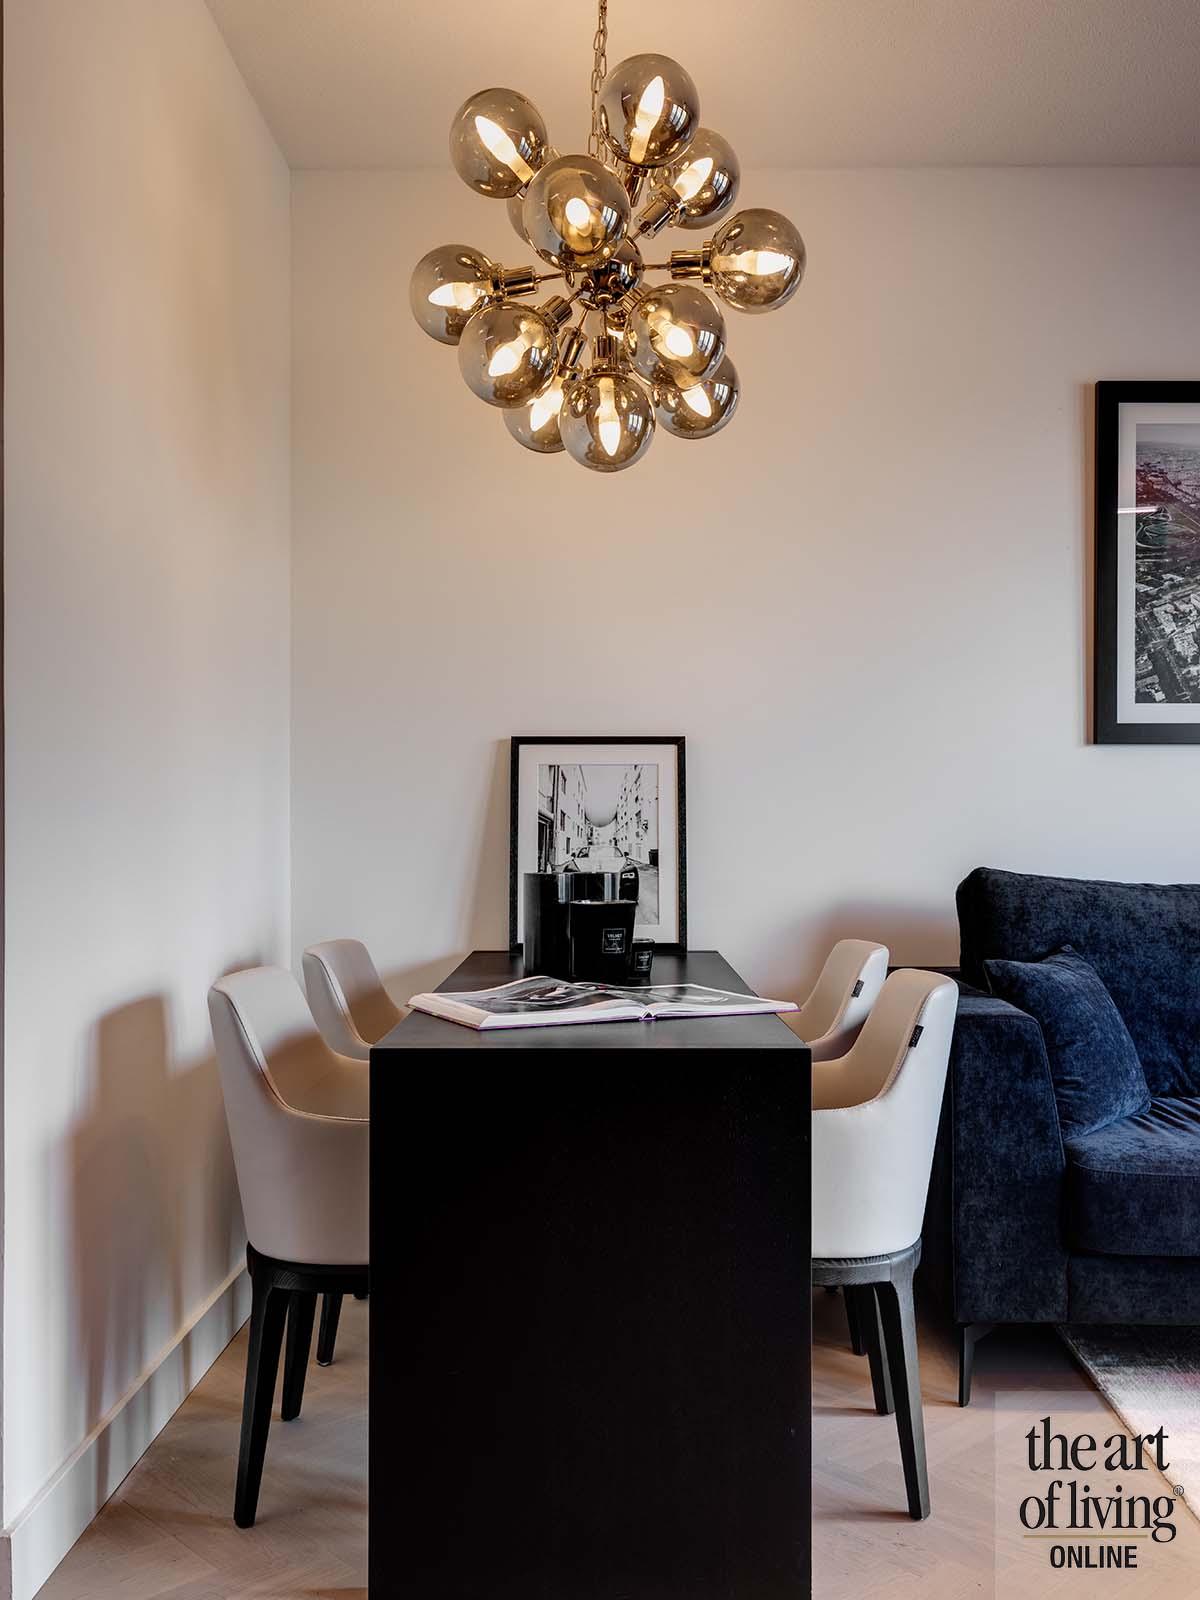 Luxe appartementen | Grand Interior, the art of living